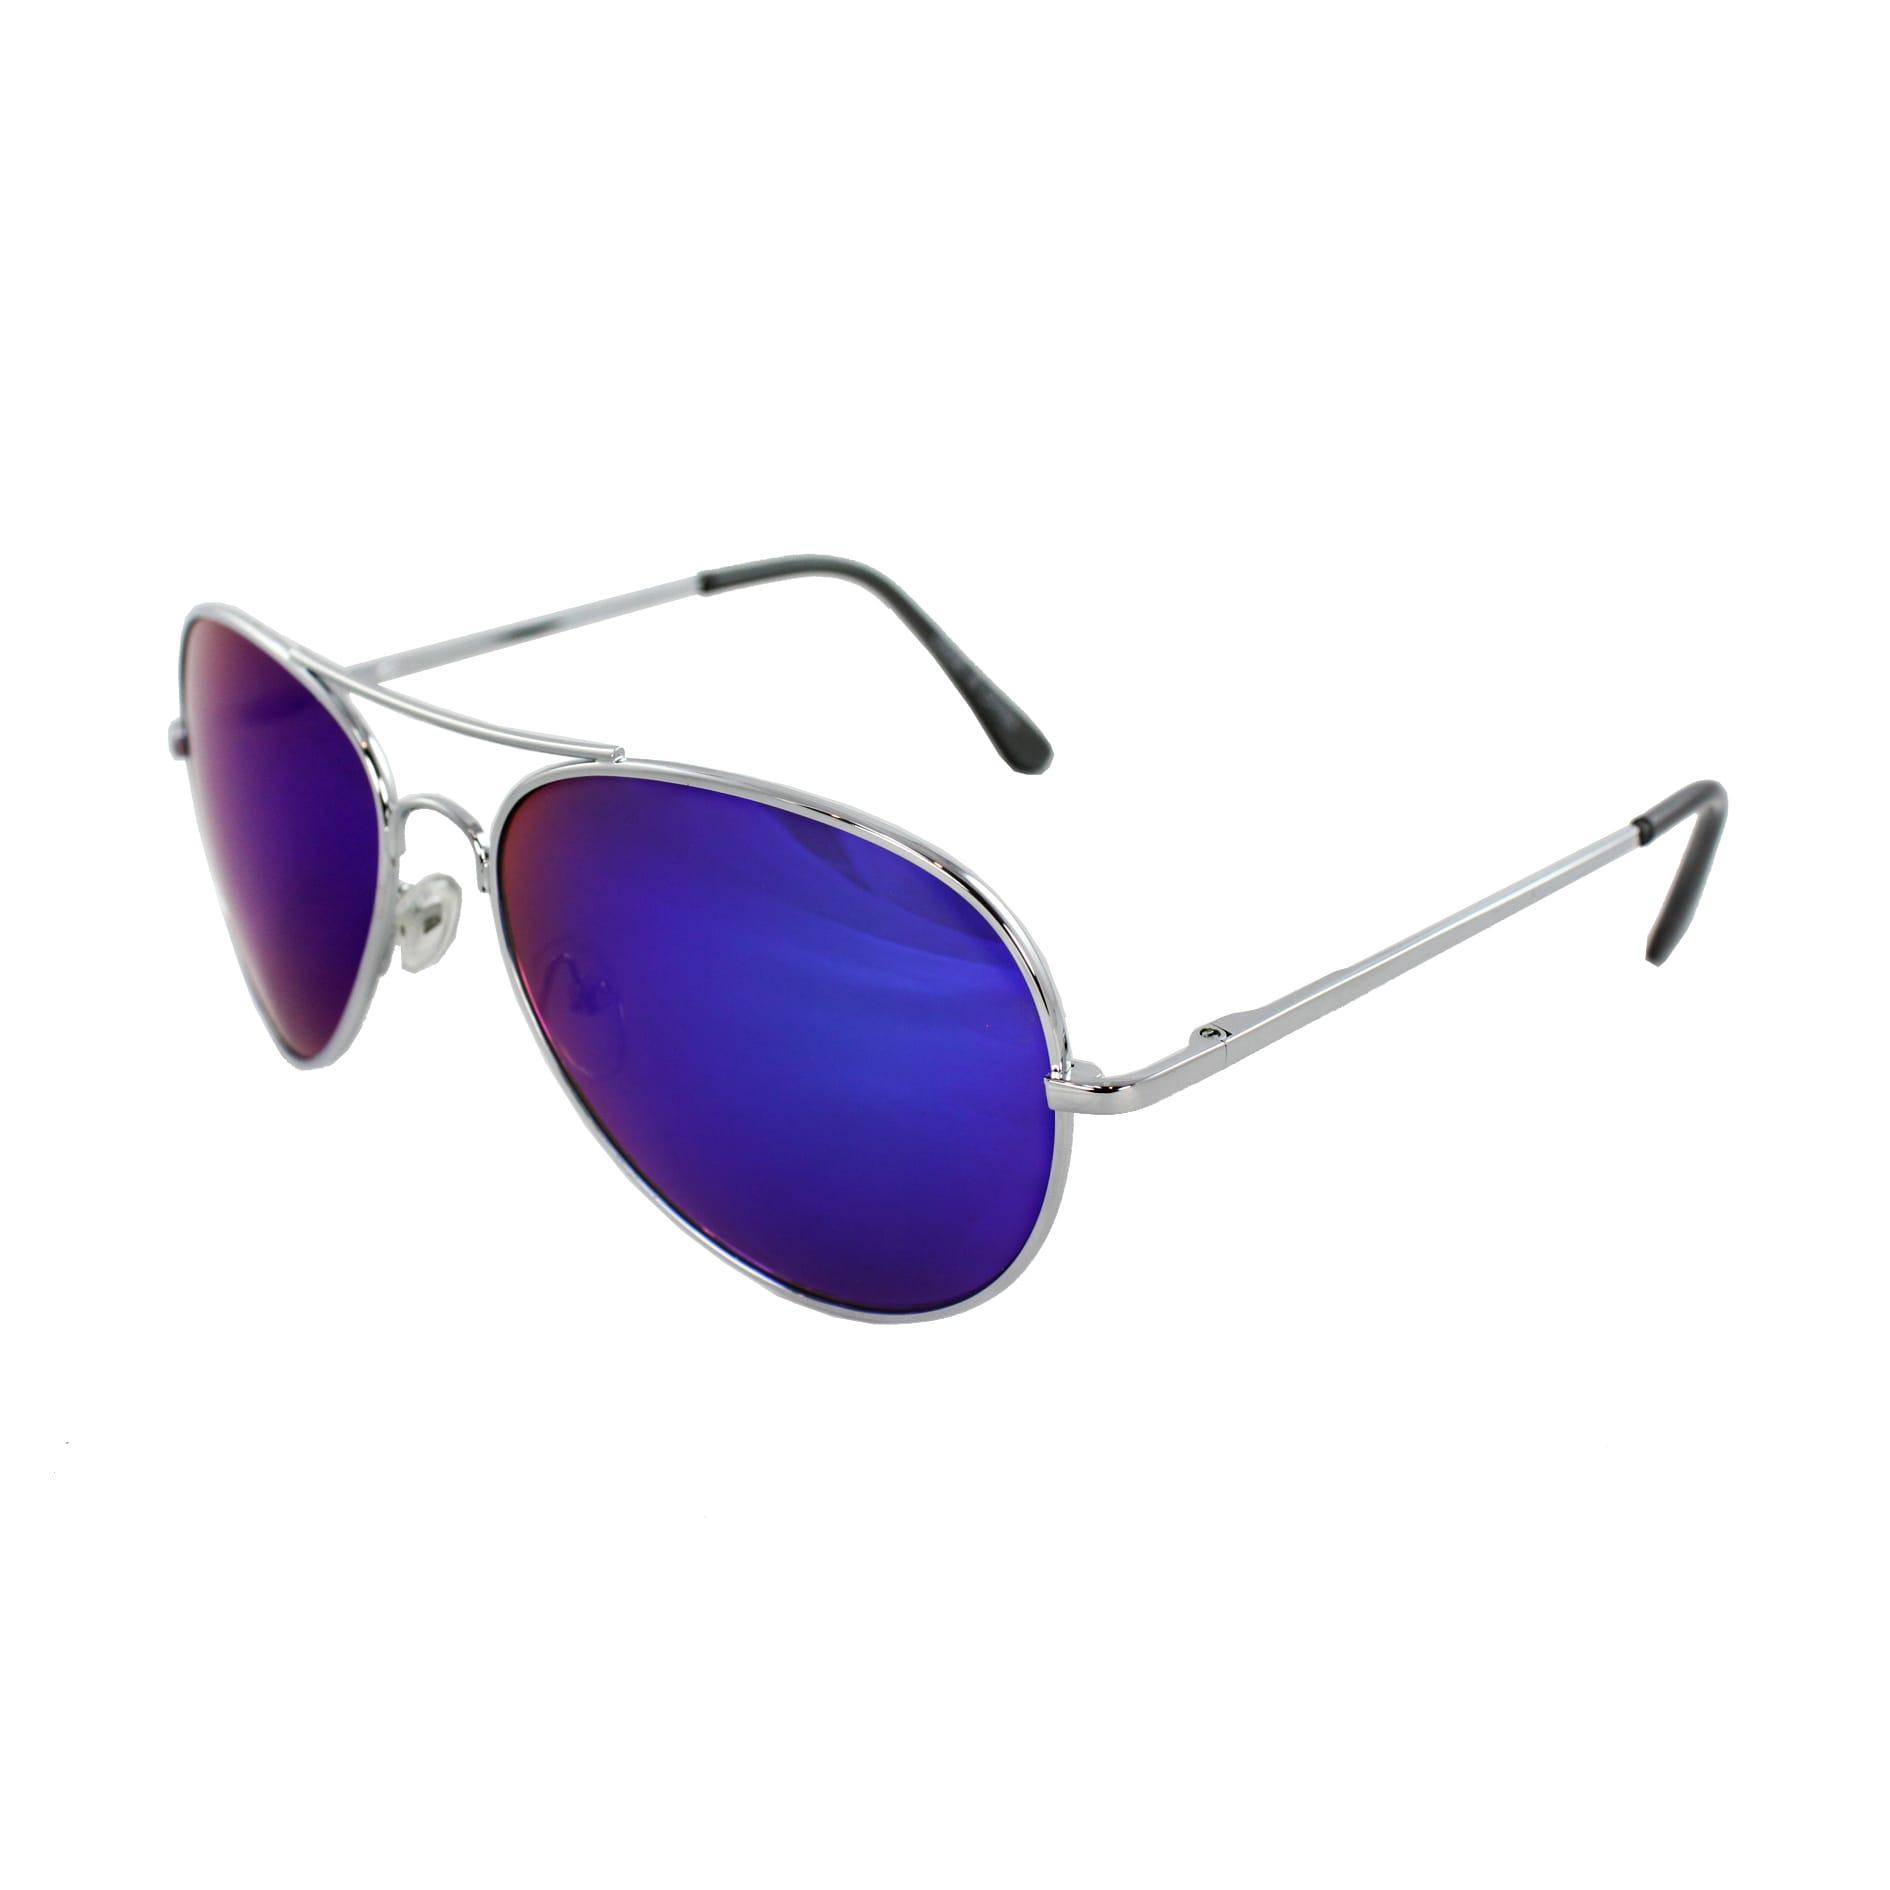 Unisex 30011R-SVRBUGNMR Metal/ Blue Mirror Aviator Sunglasses